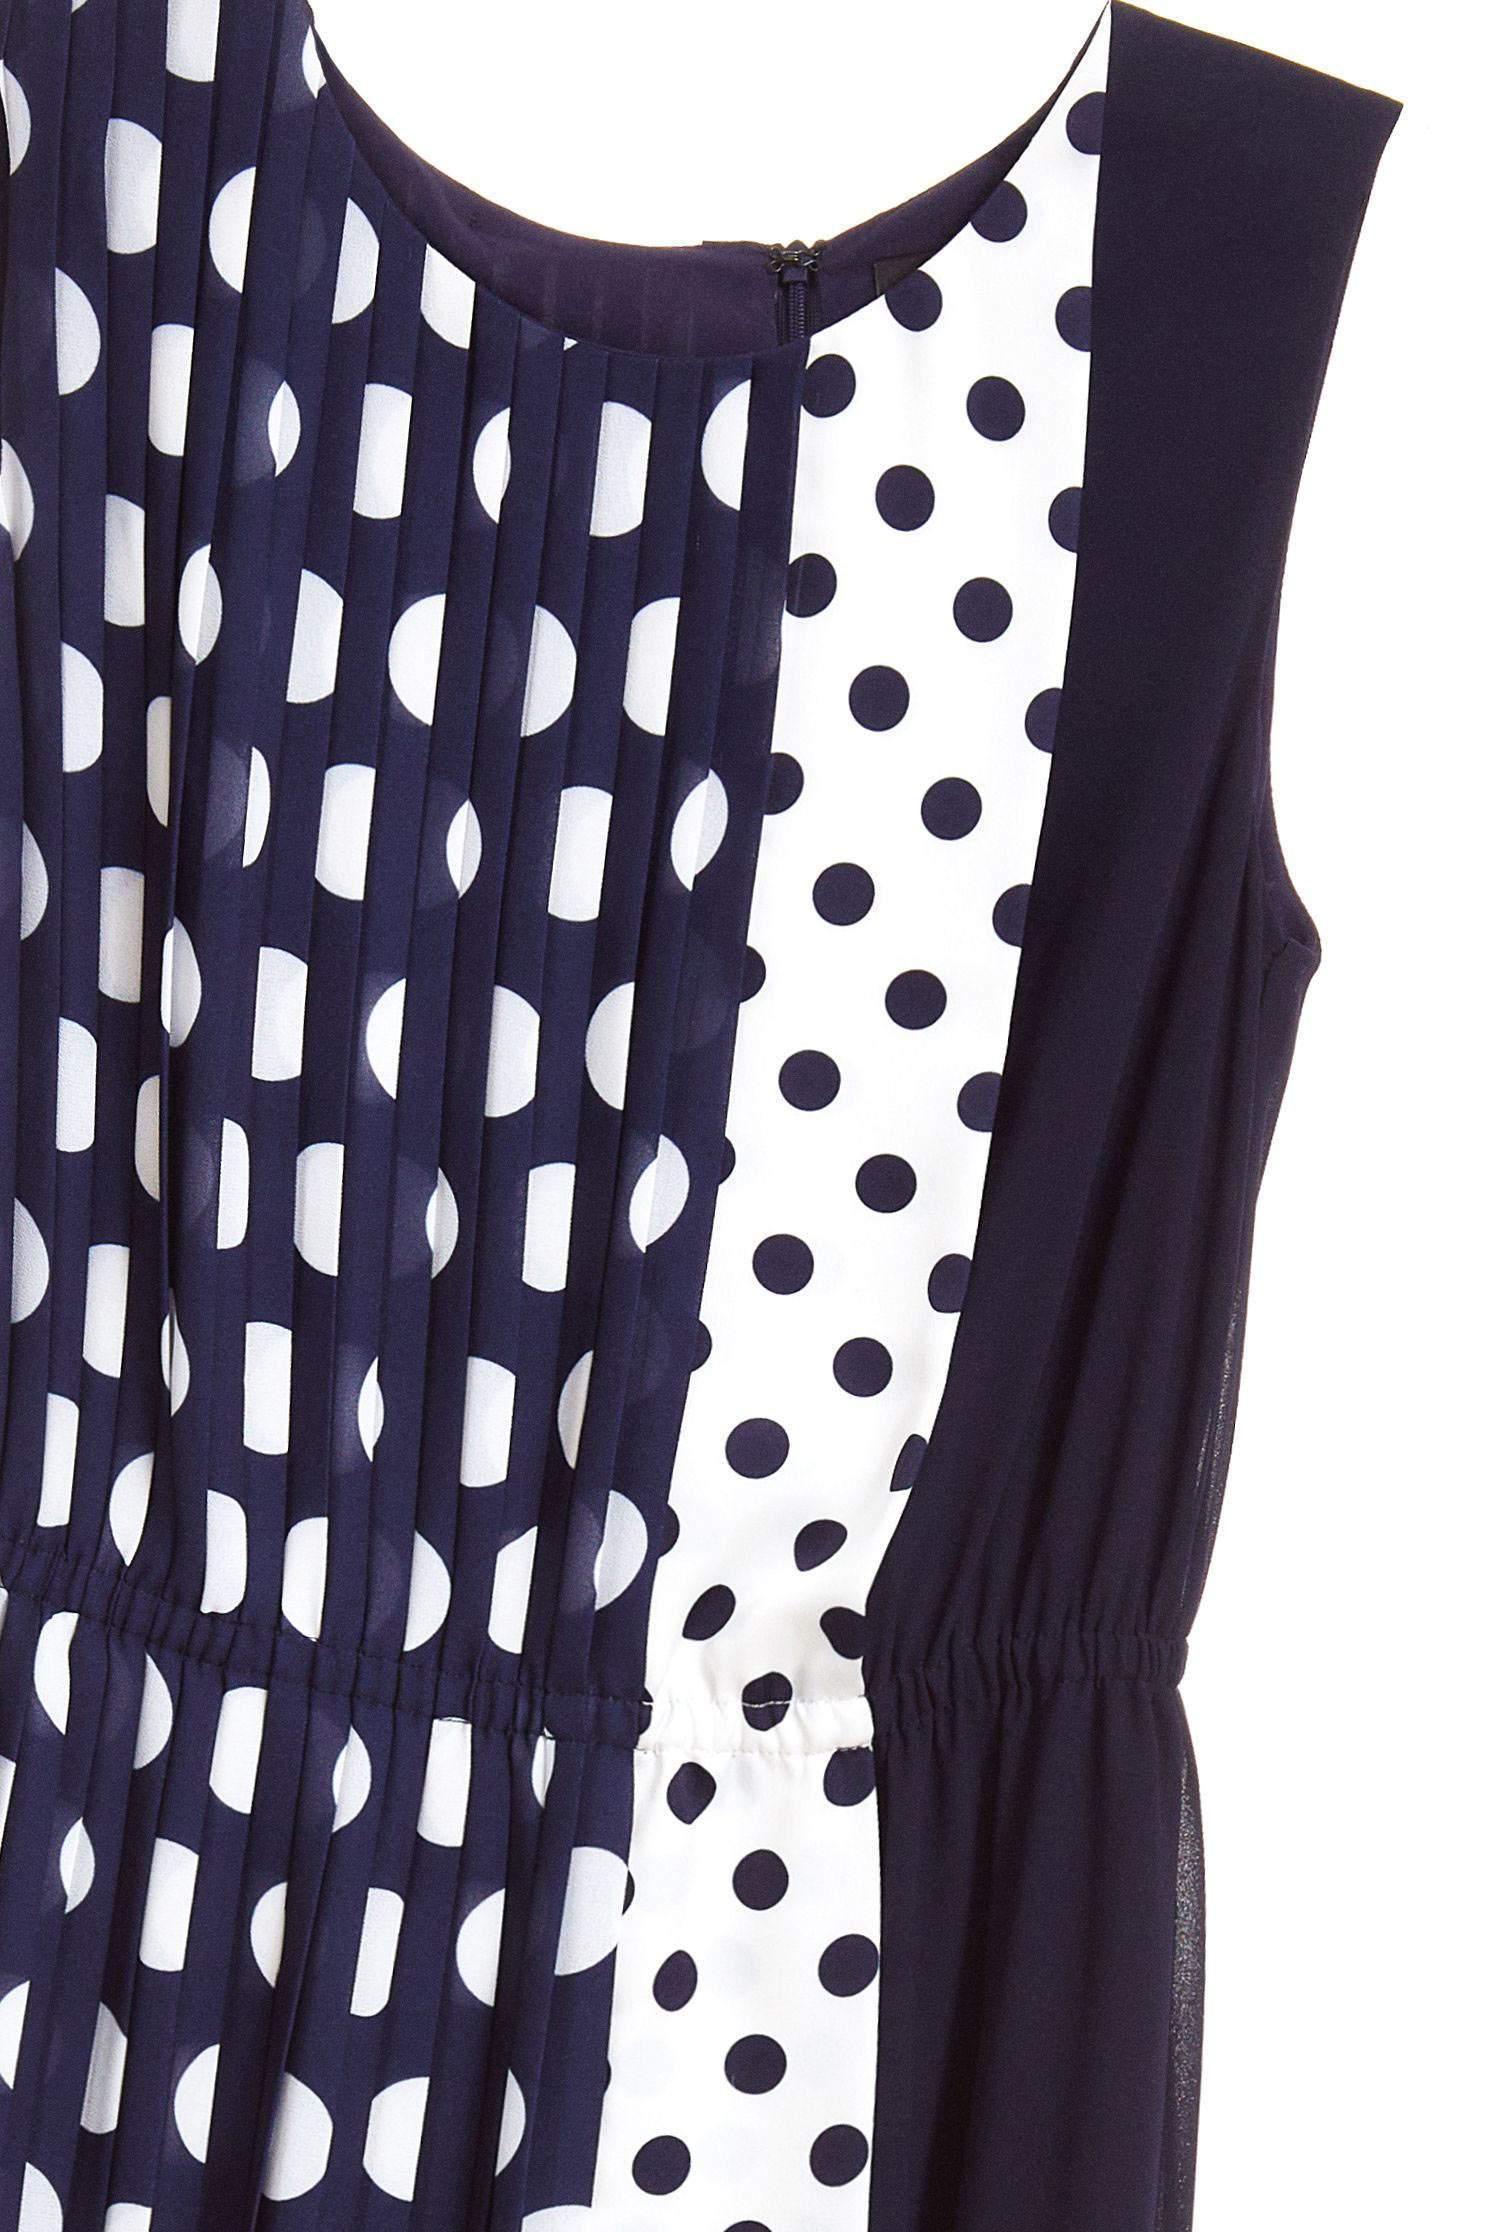 Stitching dot classic design dress,u-neckdress,dress,sleevelessdress